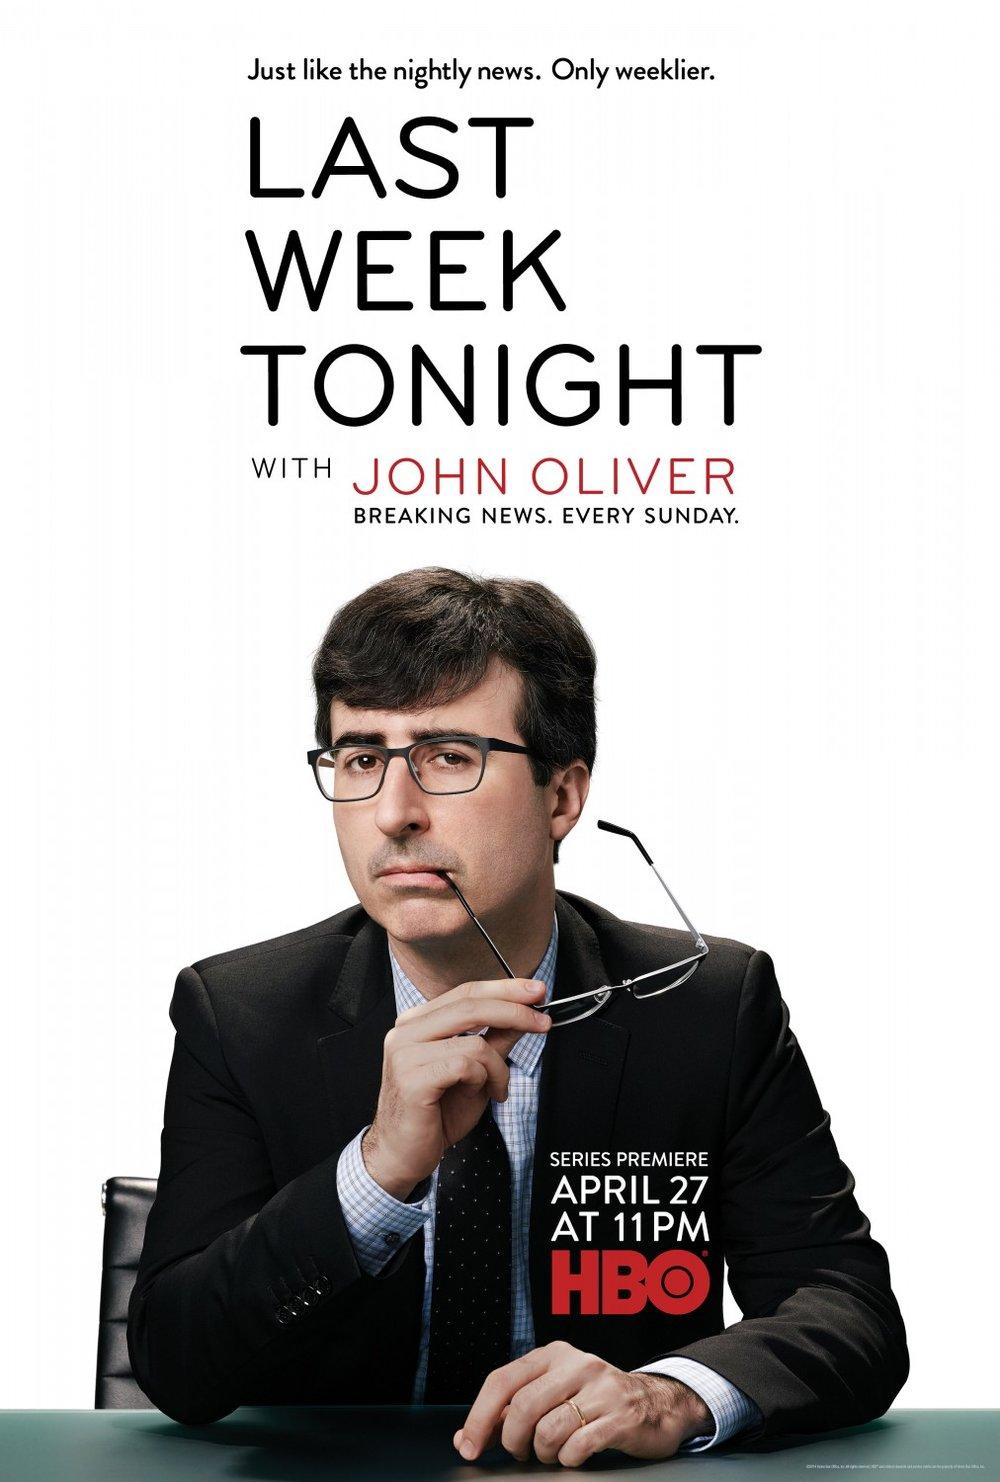 last_week_tonight_with_john_oliver_xlg.jpg